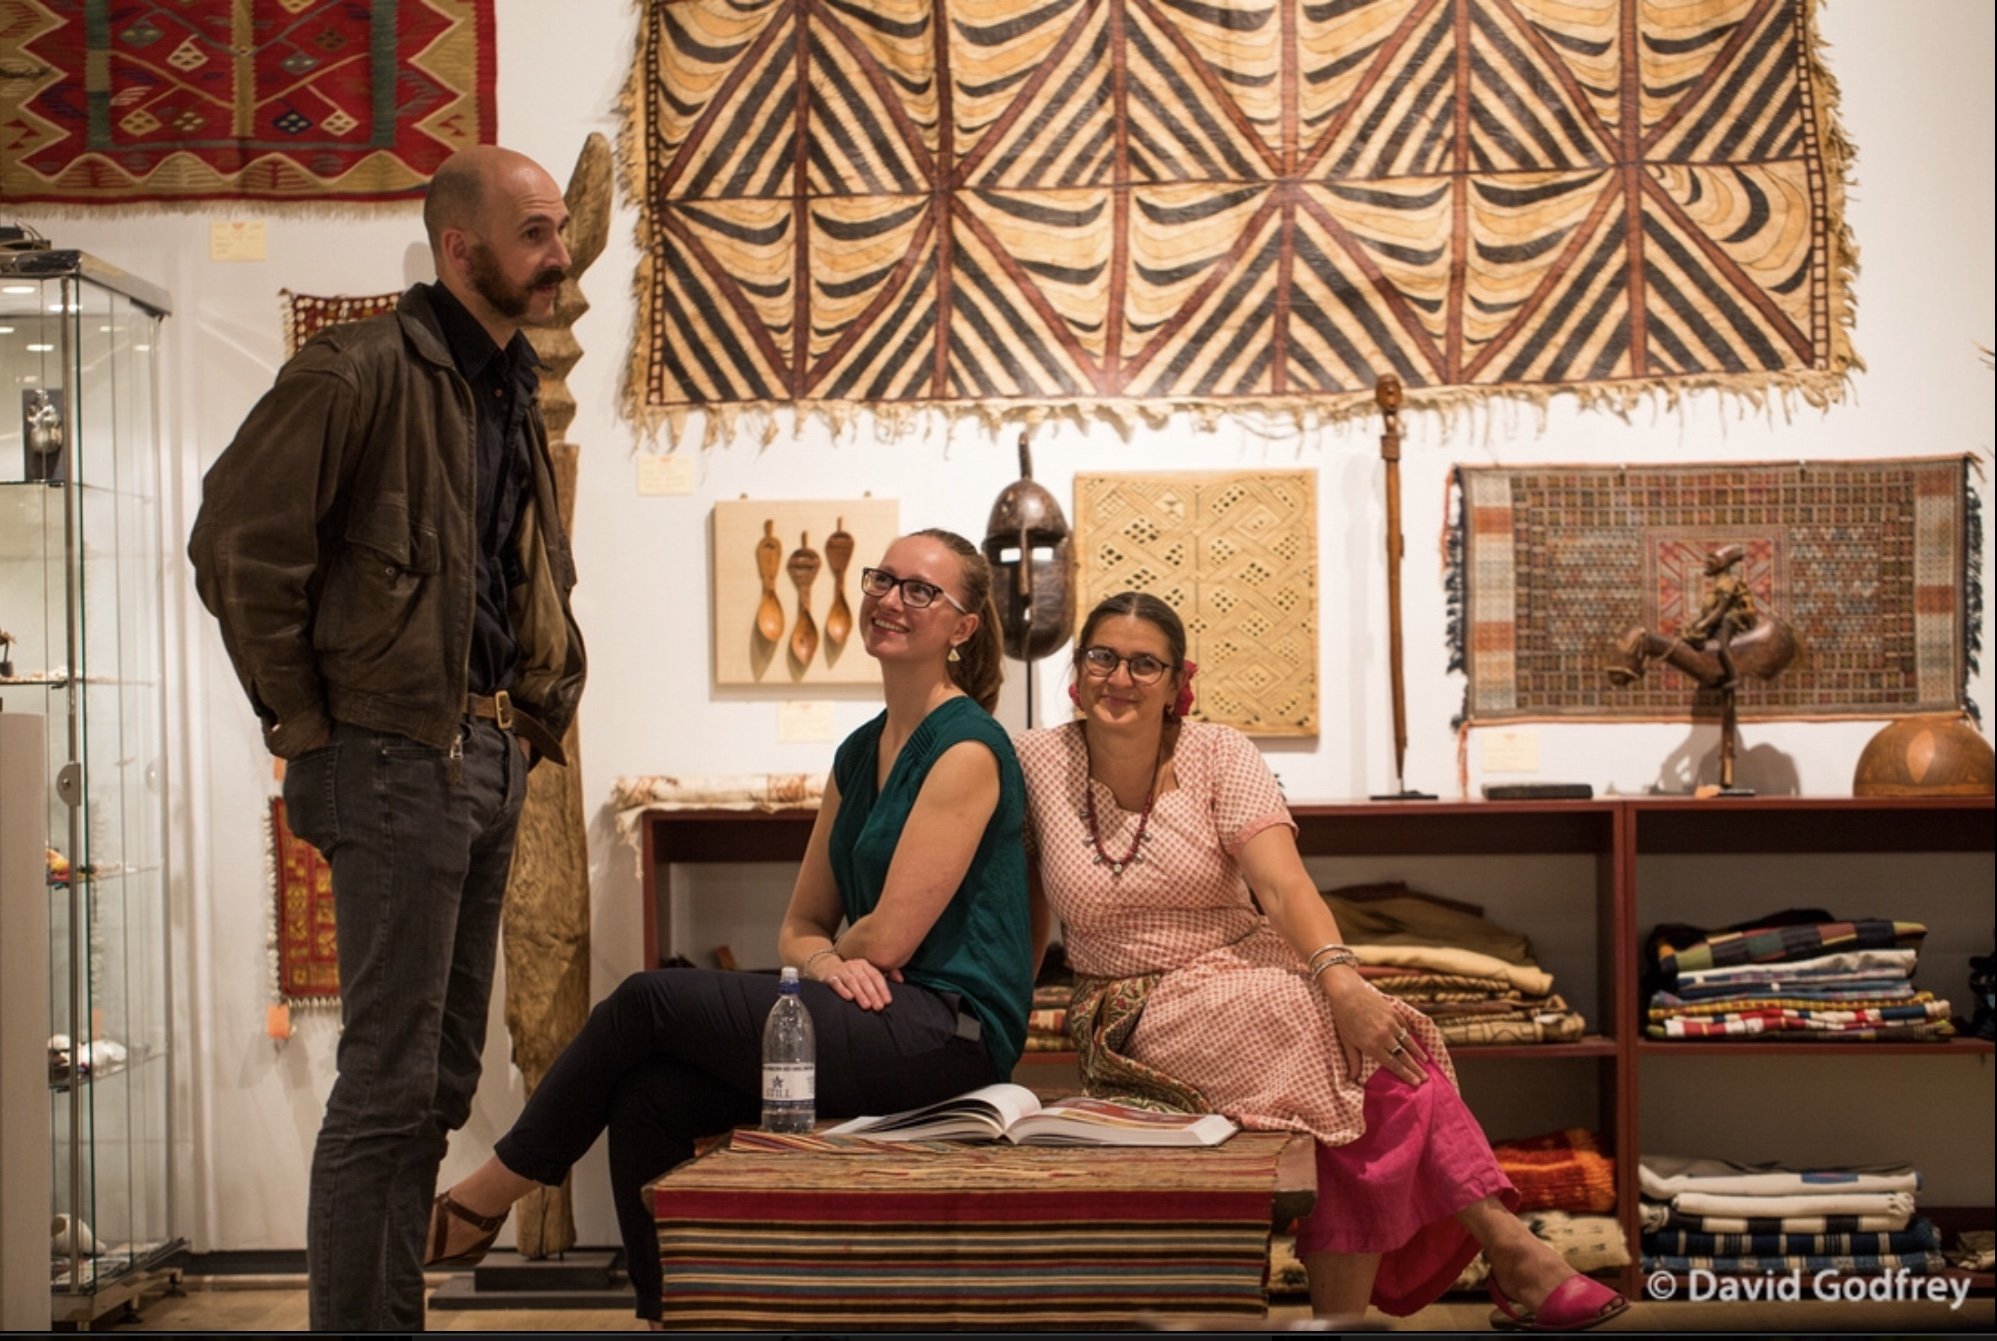 Welcome to Tribal Art Fair 2018